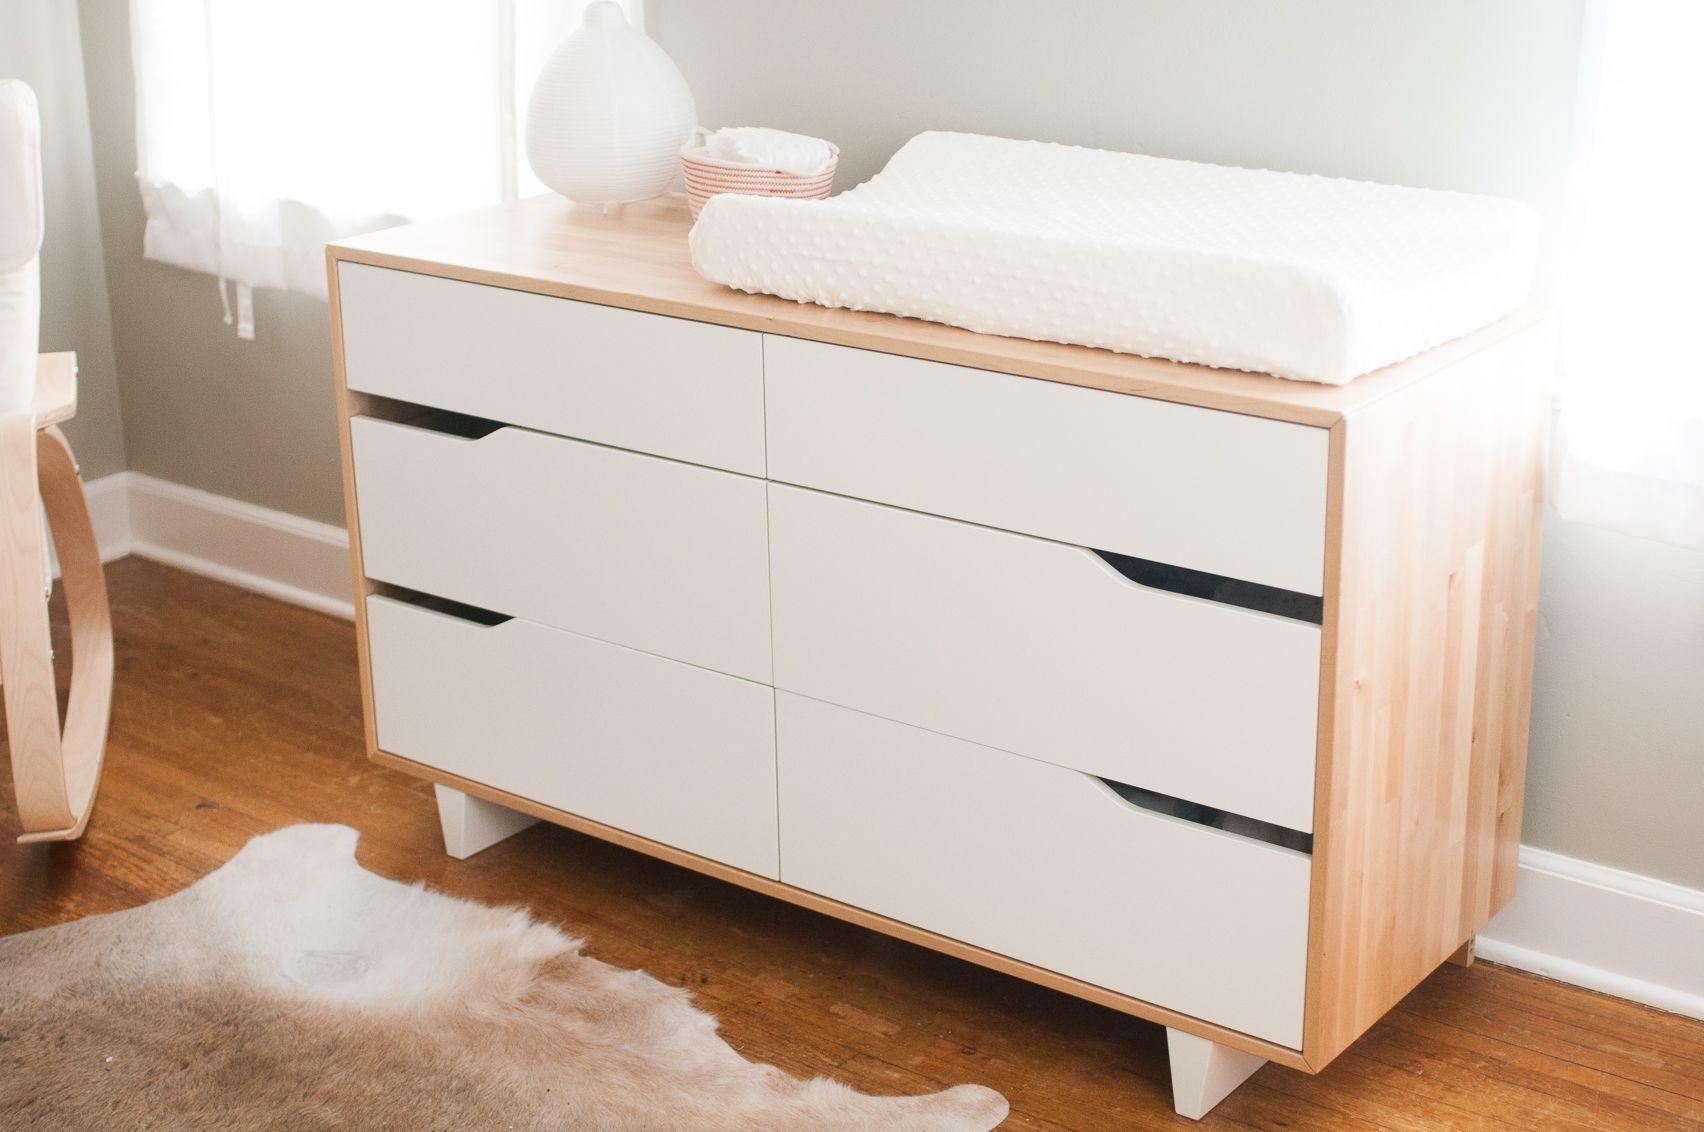 Tiny Box Room Ikea Stuva Loft Bed Making The Most Of: Mandal Dresser From Ikea